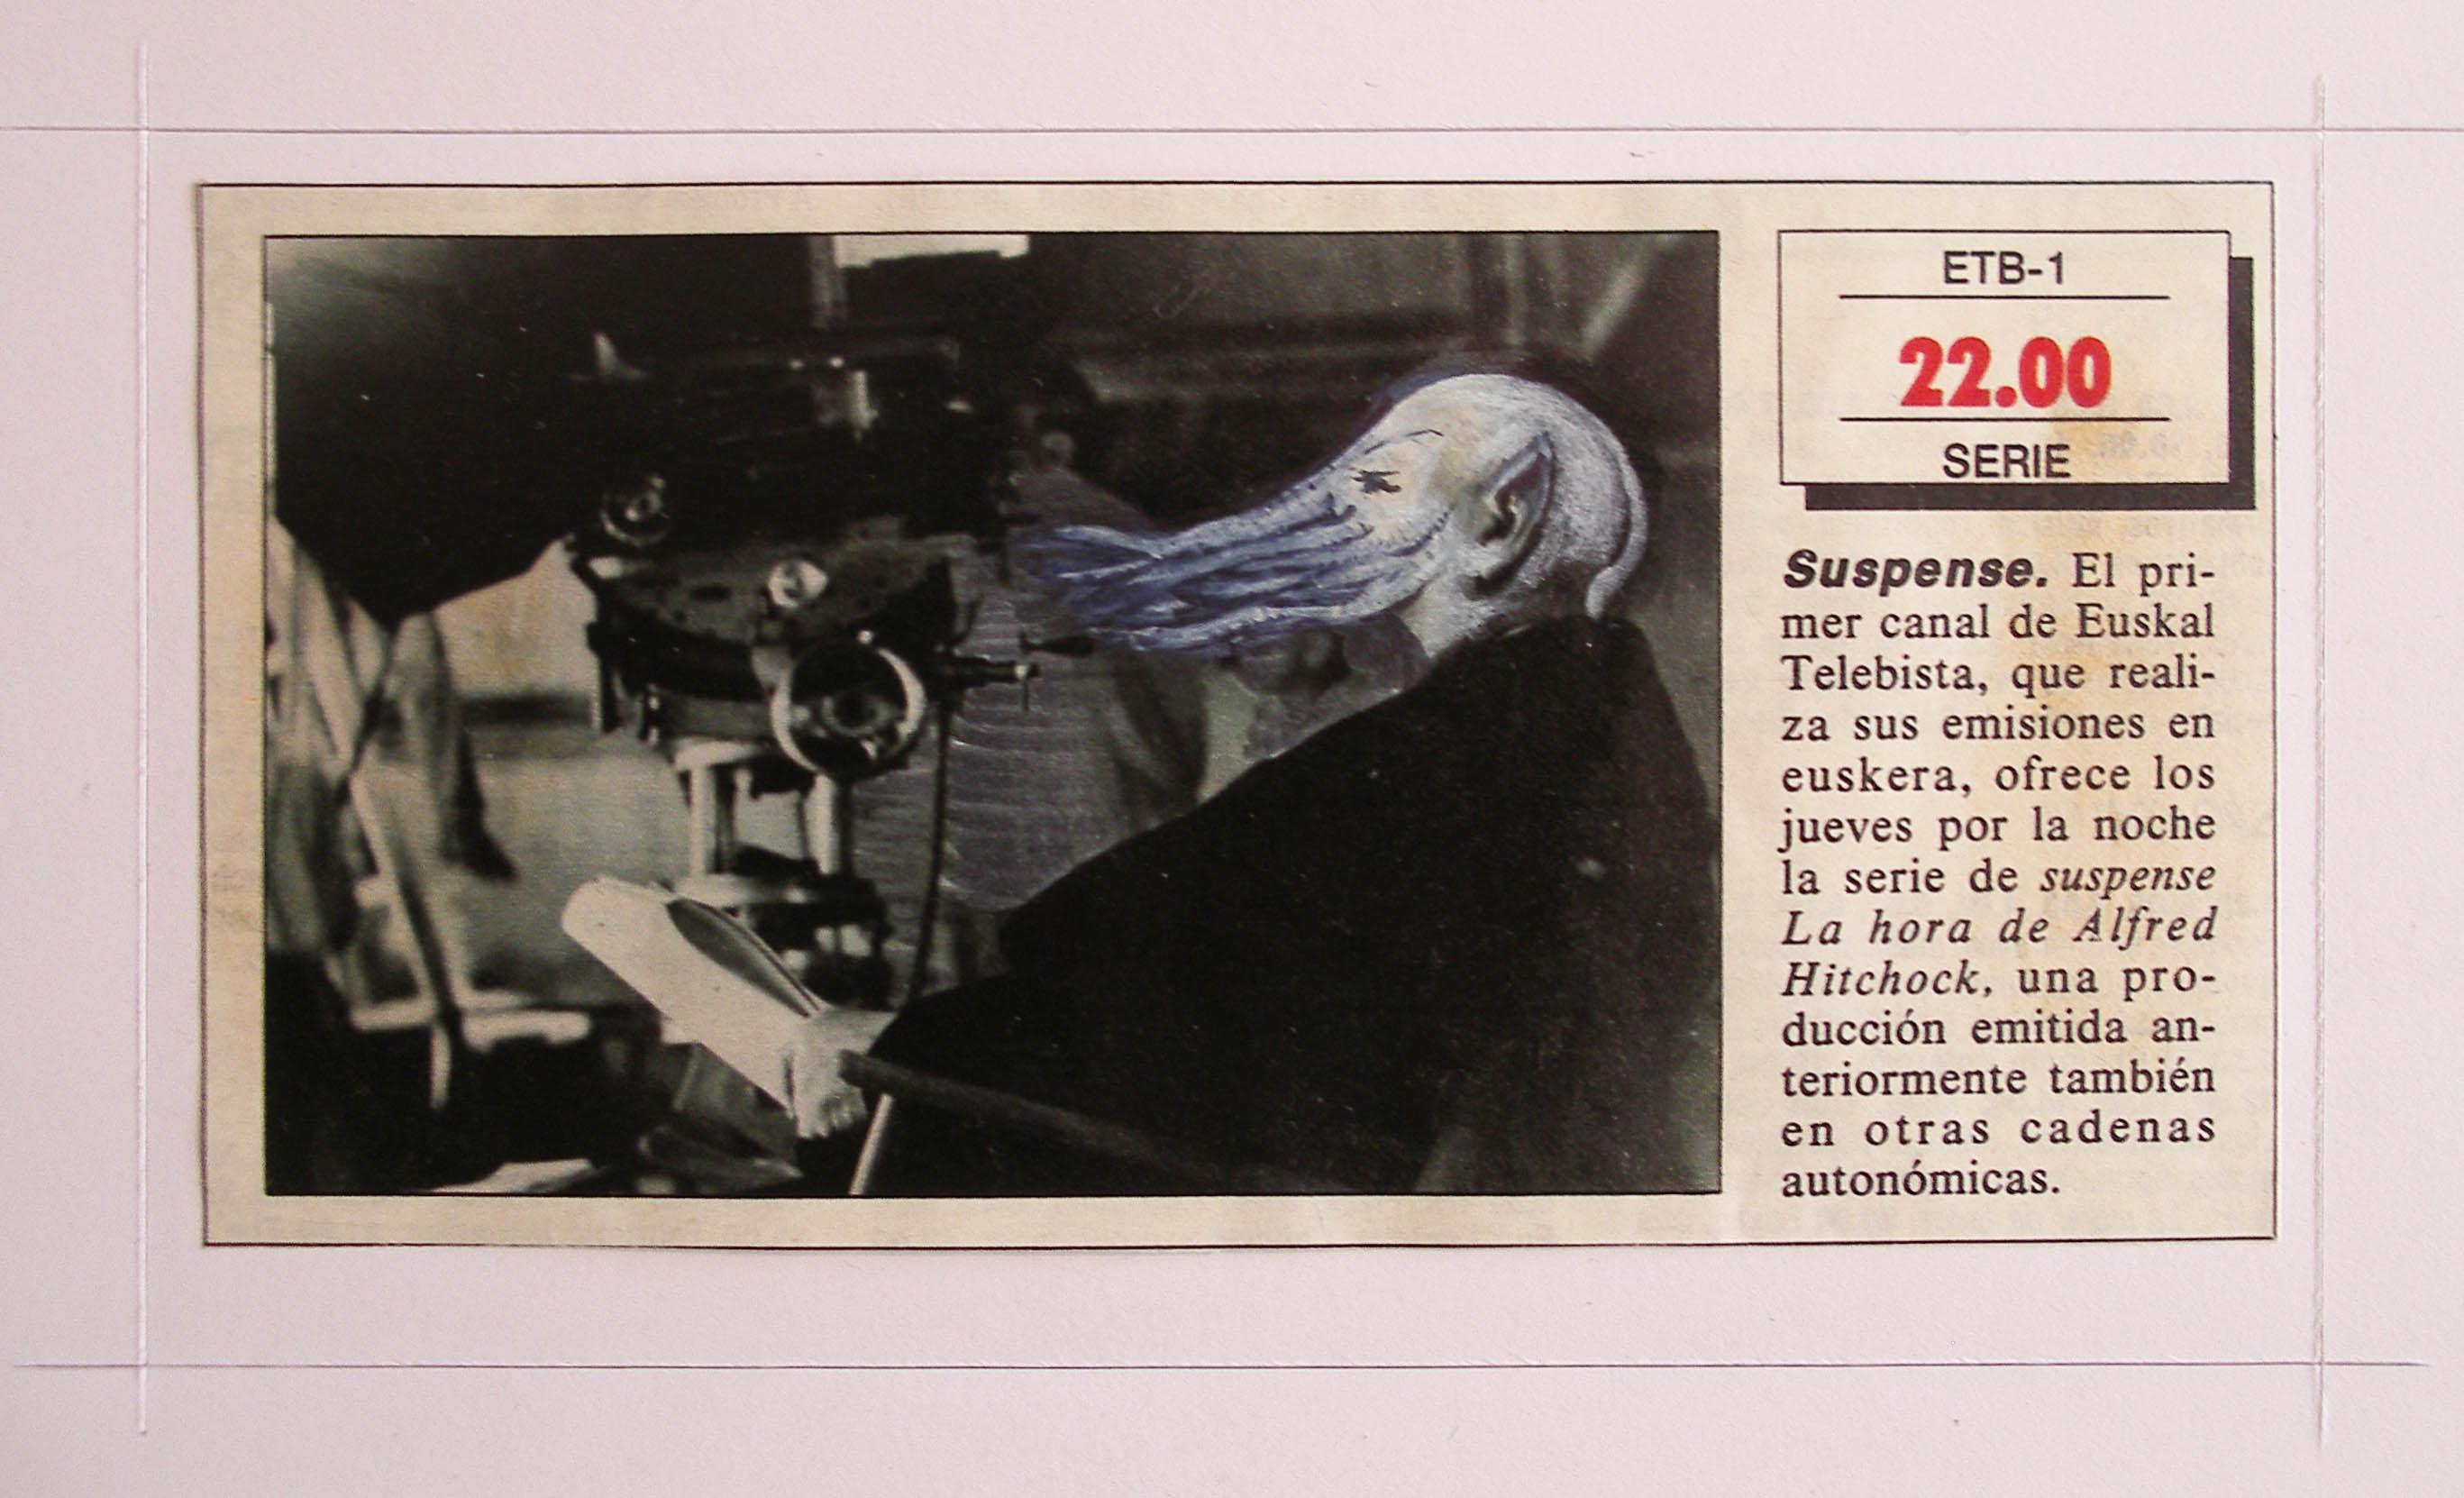 Luis Pita | Intervenciones sobre papel de periódico | Interventions on newspaper | Drawing on press paper | The artist at play (1990) | Hitchcock | Lovercraft | INTERVENCIONES_ A character | Un personaje_ 01